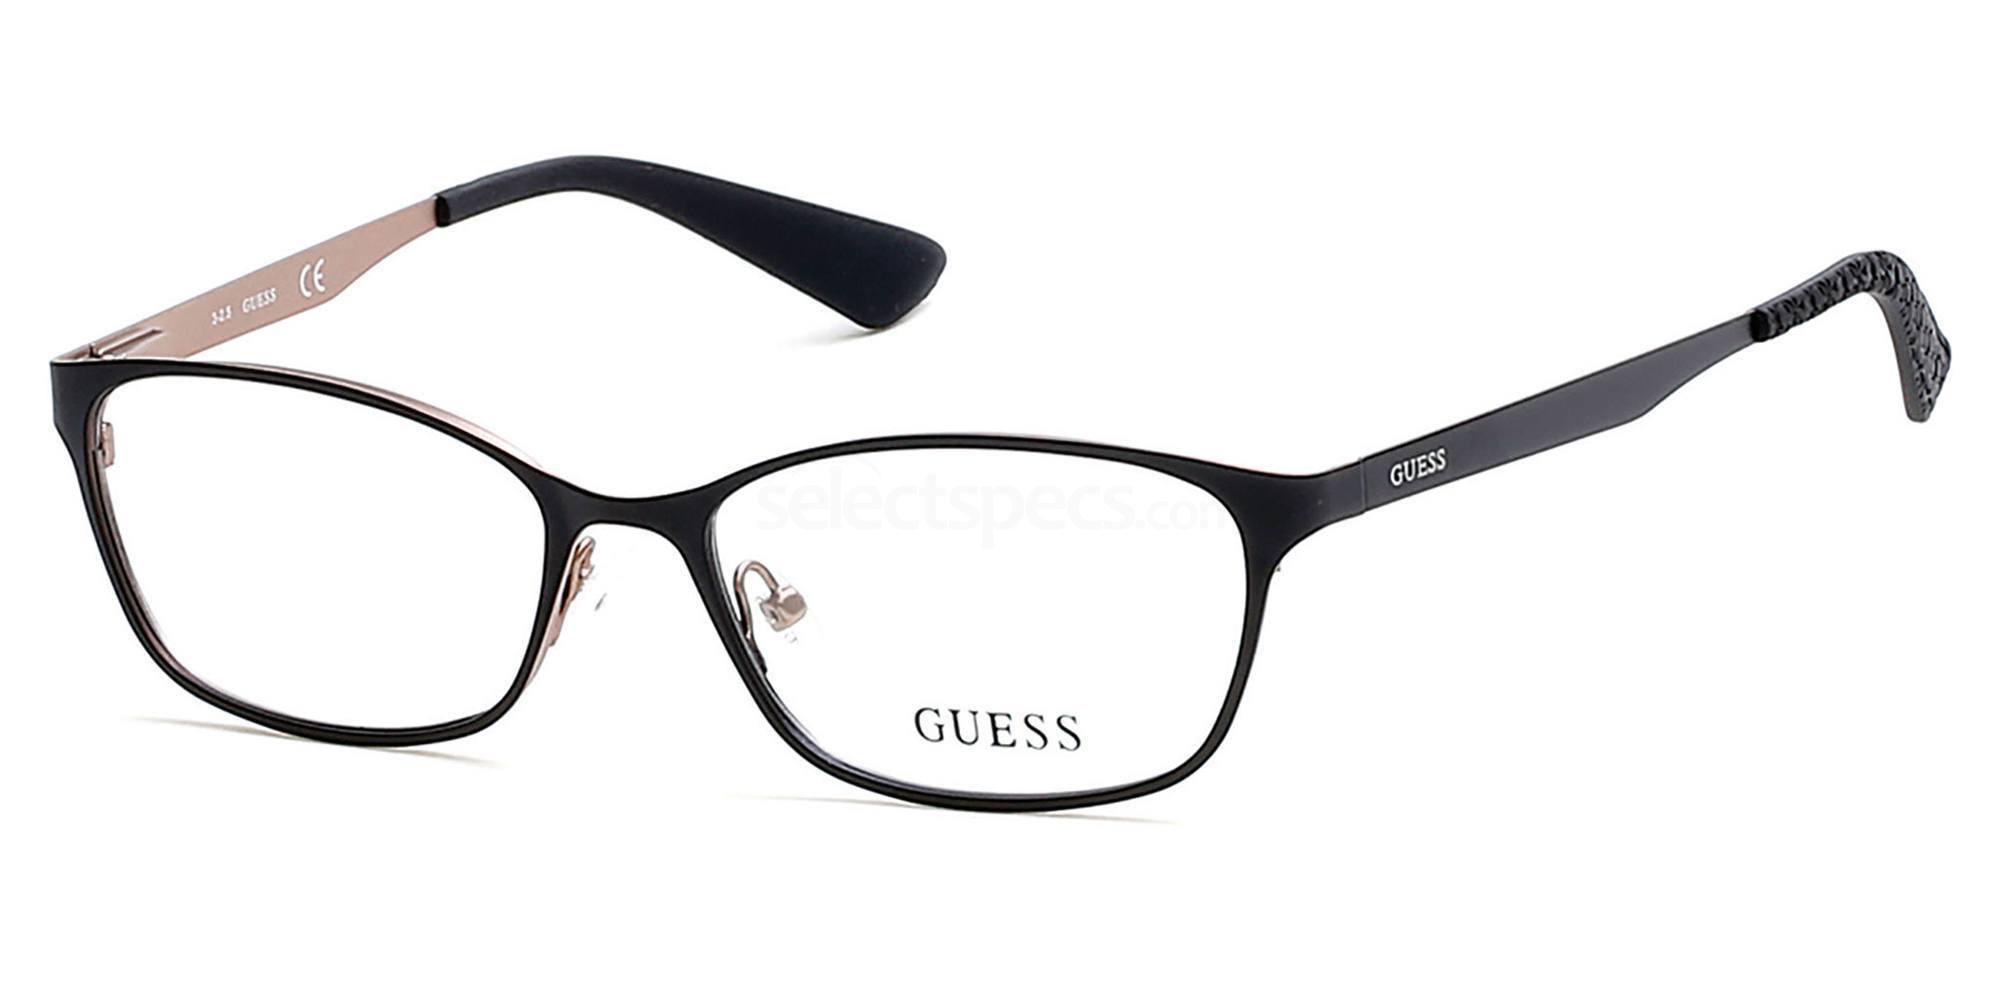 002 GU2563 Glasses, Guess